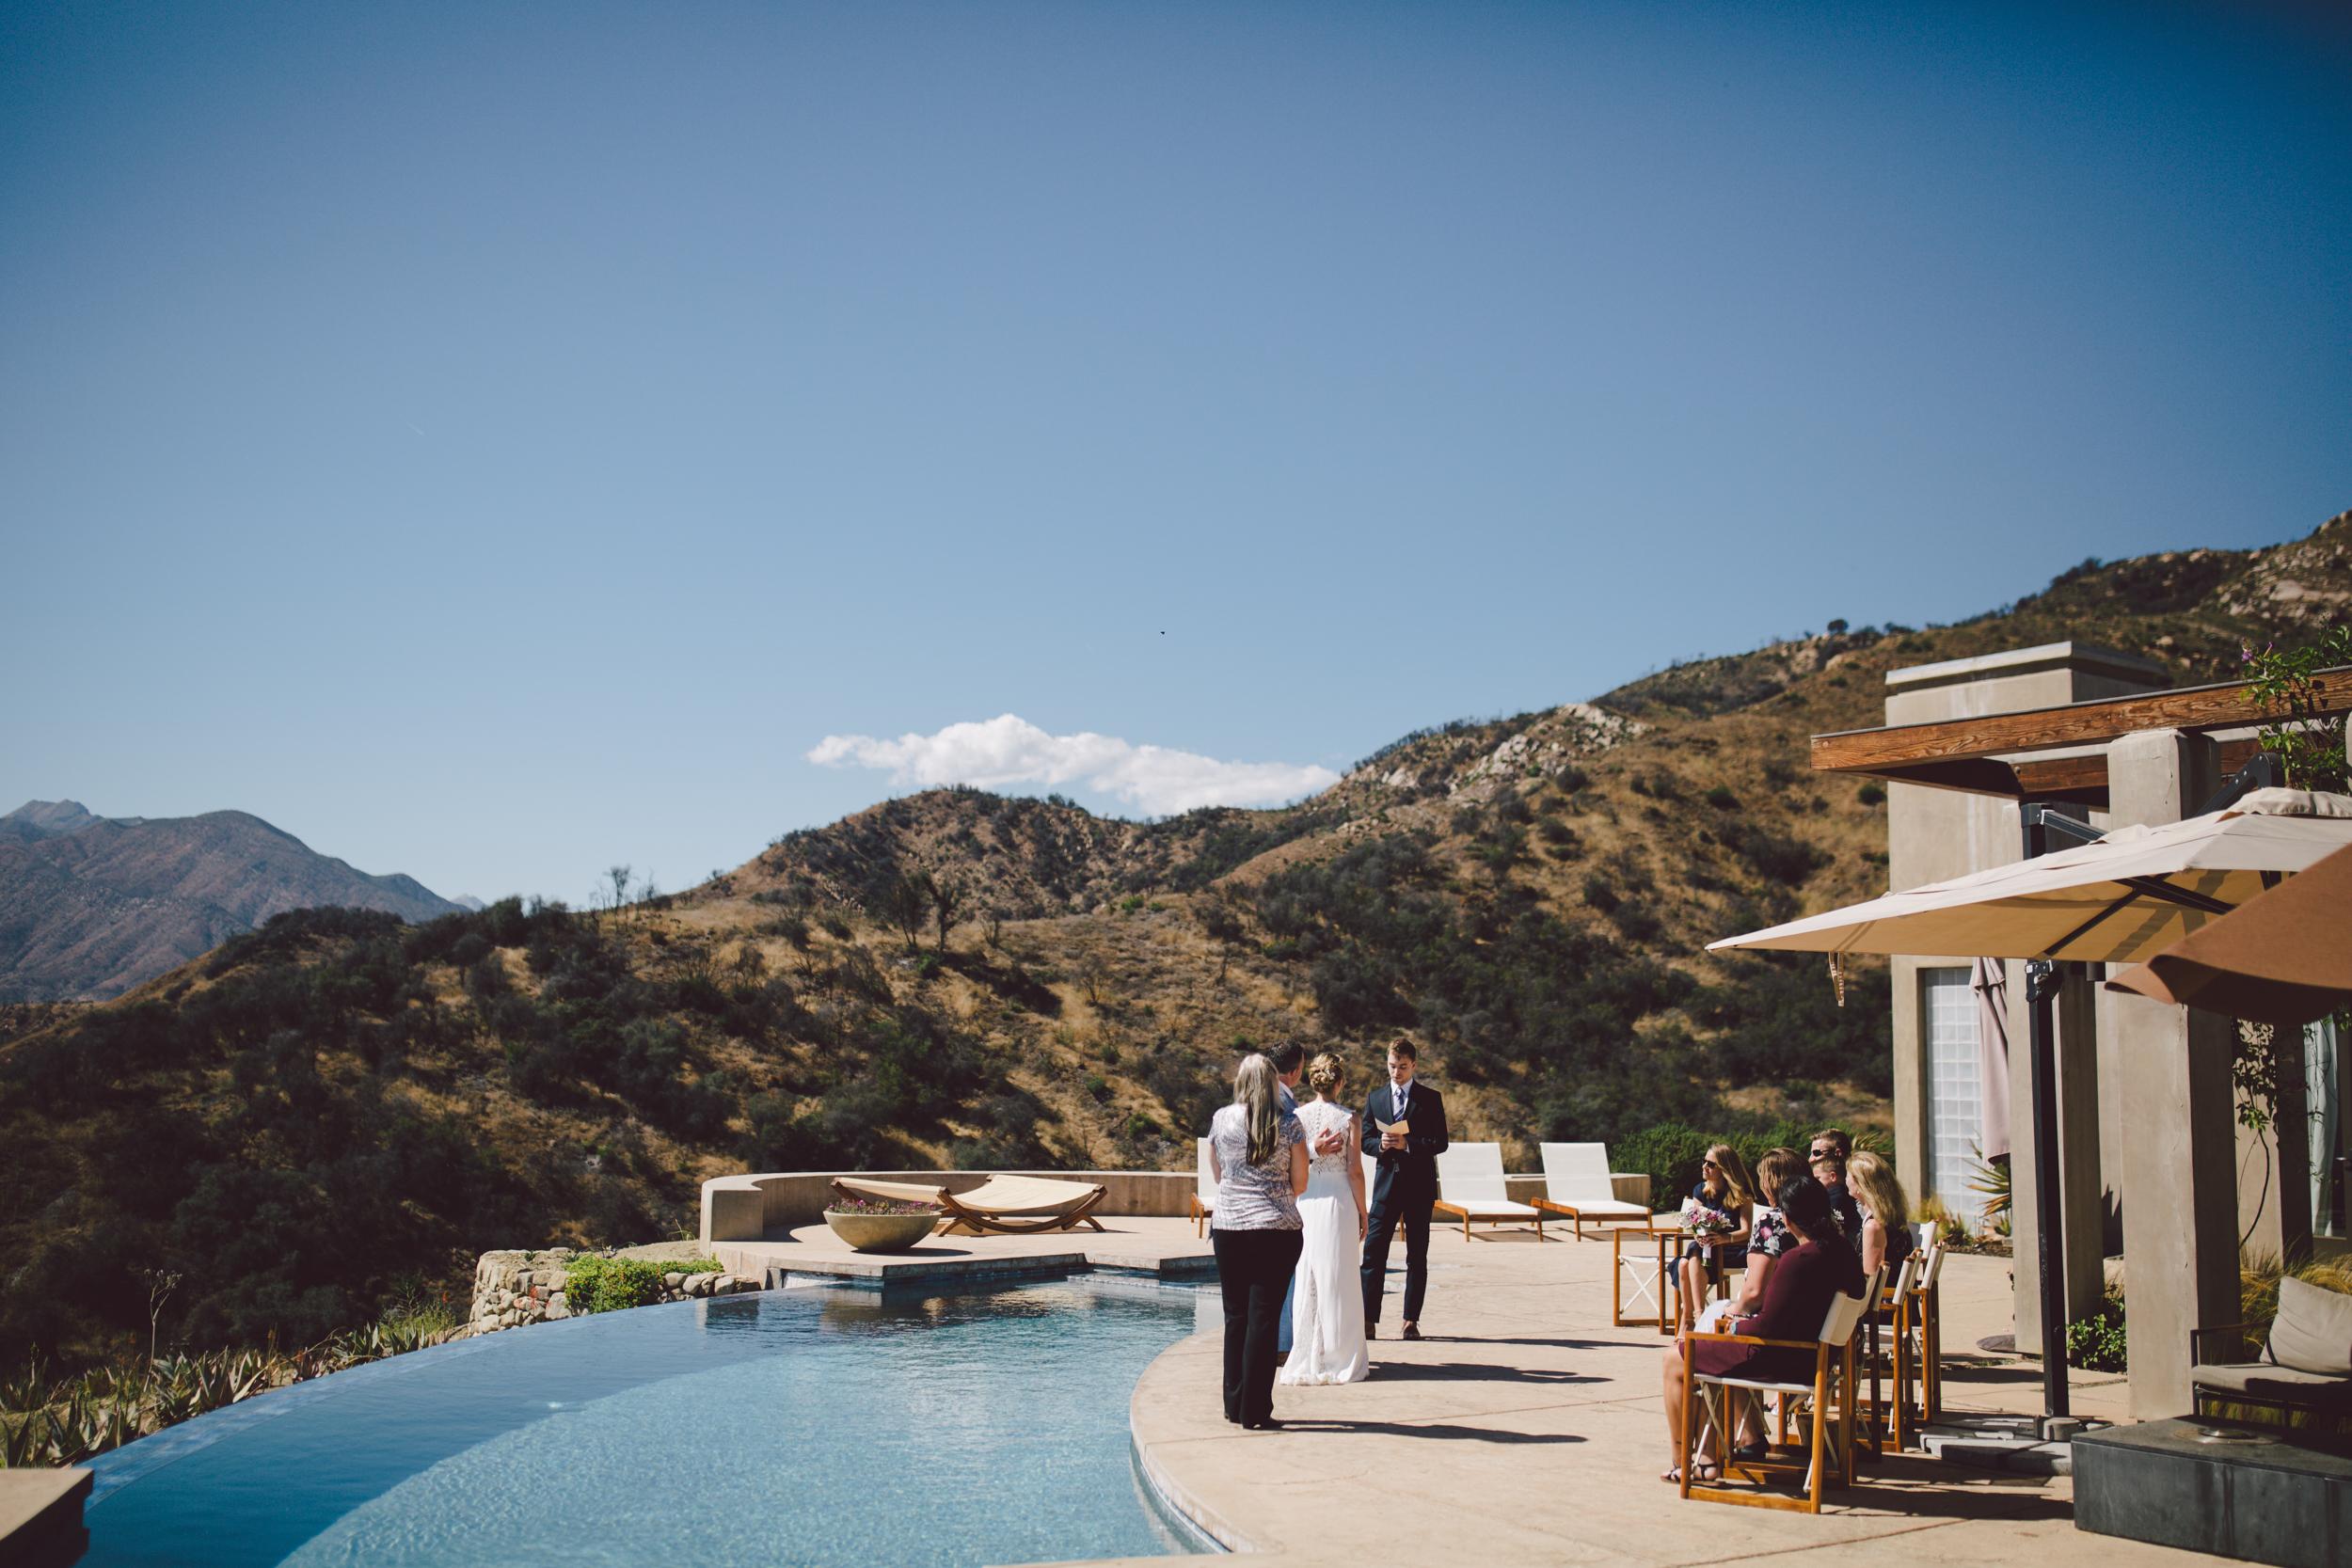 ojai california private estate intimate elopement outdoors mountains